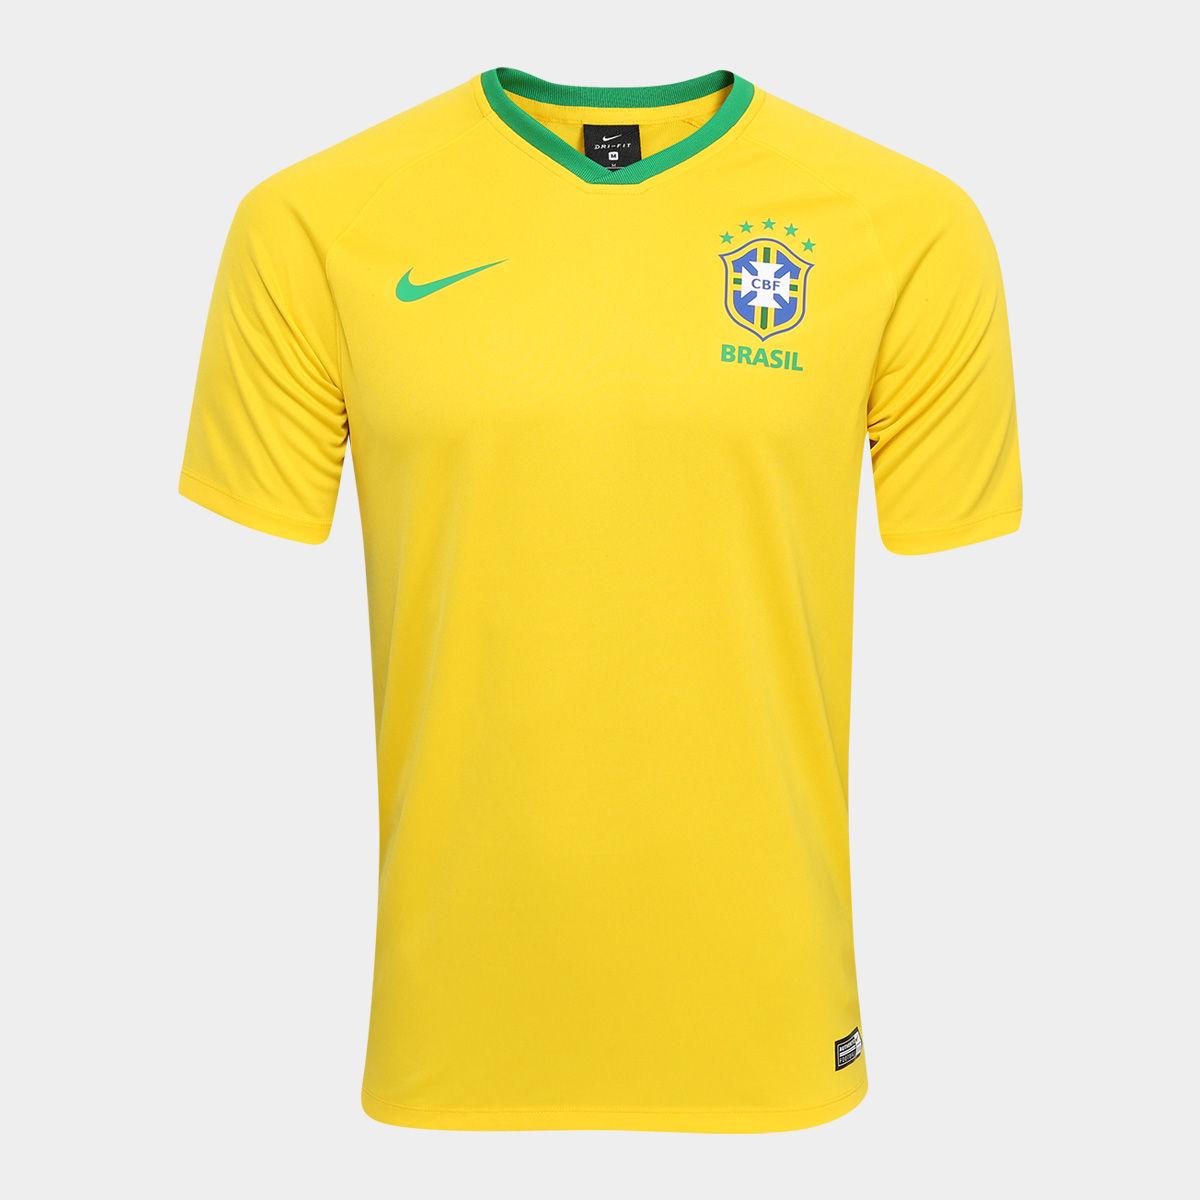 camisa nike torcedor brasil - Camisa Brasil 2018 Torcedor Nike - R$ 149,90